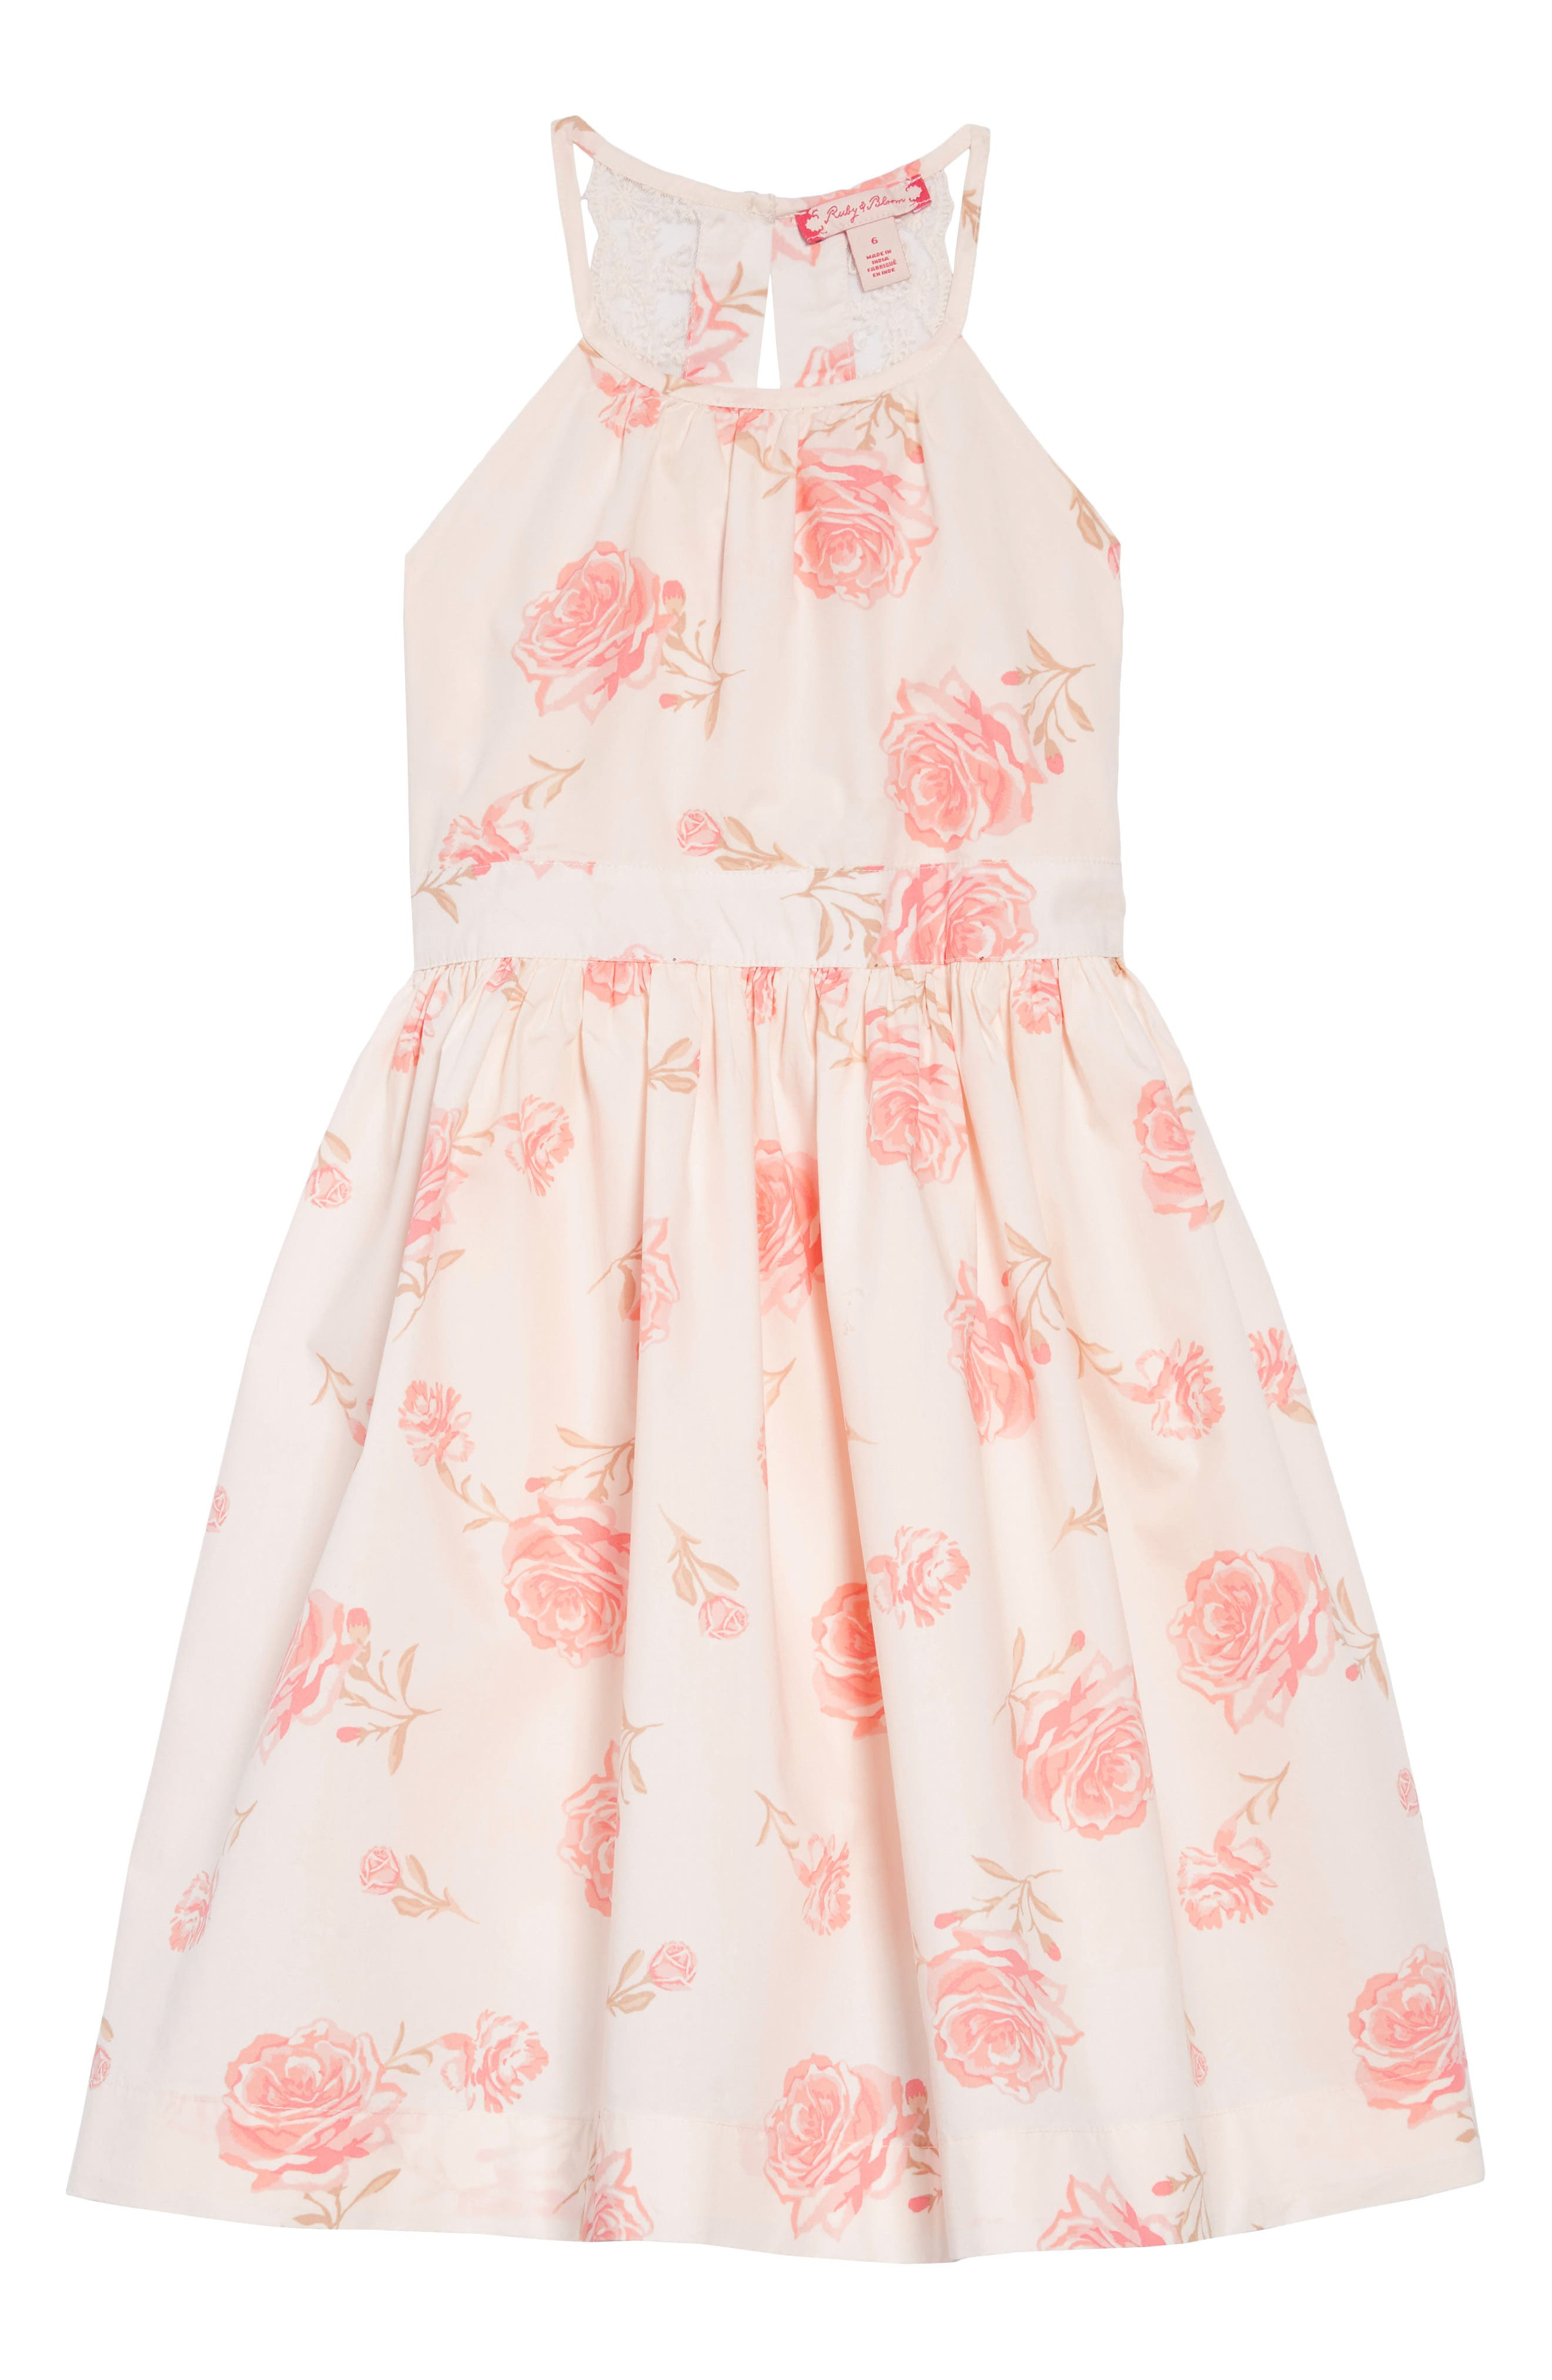 RUBY & BLOOM,                             Lovely Lace Dress,                             Main thumbnail 1, color,                             IVORY EGRET ELEGANT FLORAL